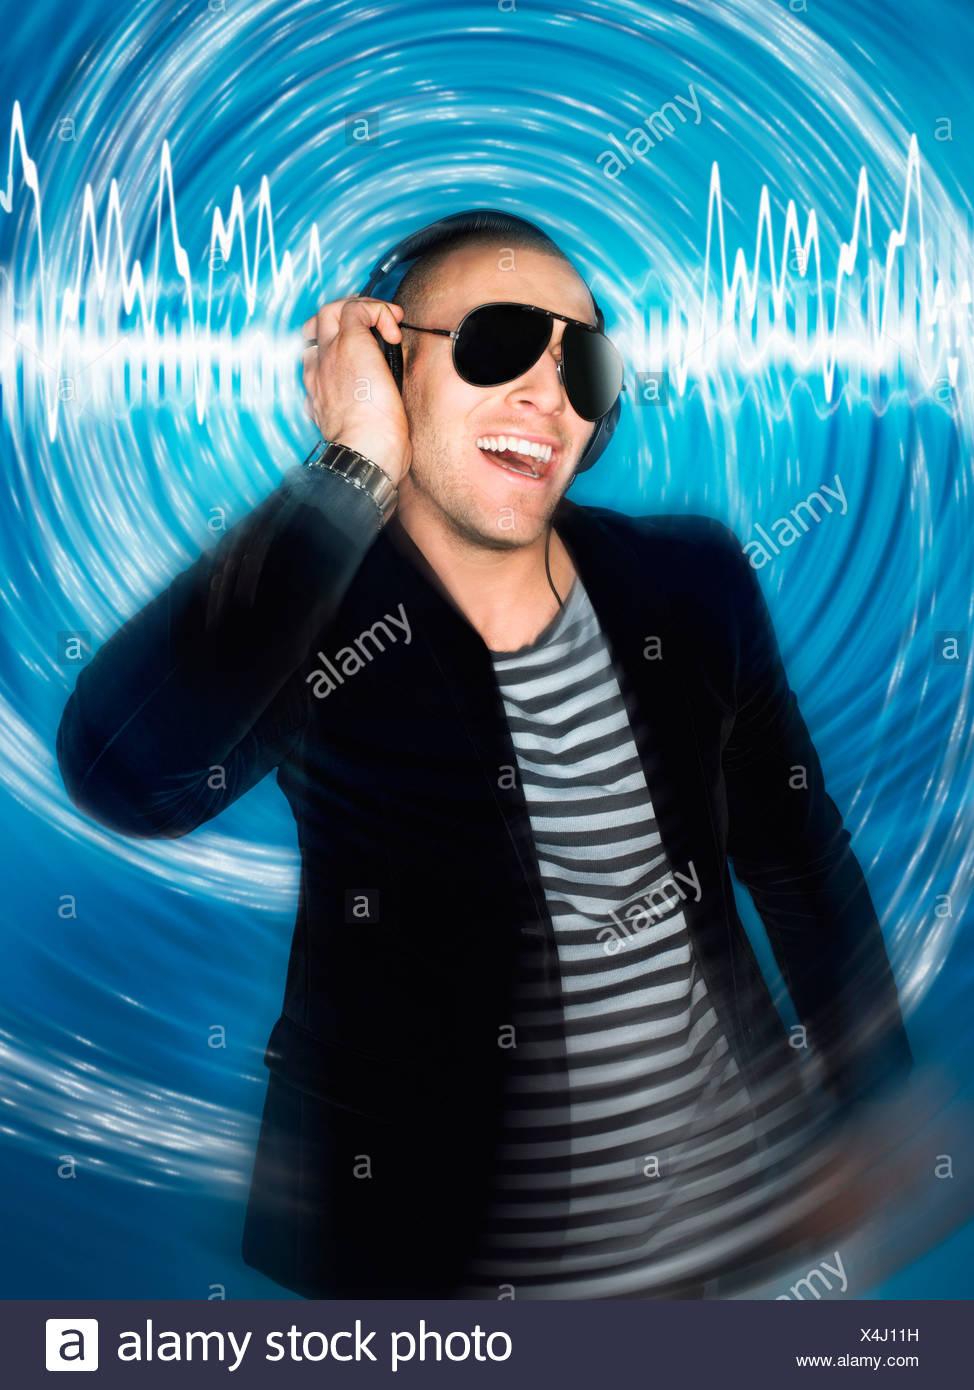 Man wearing headphones in front of circular effect, half-length - Stock Image